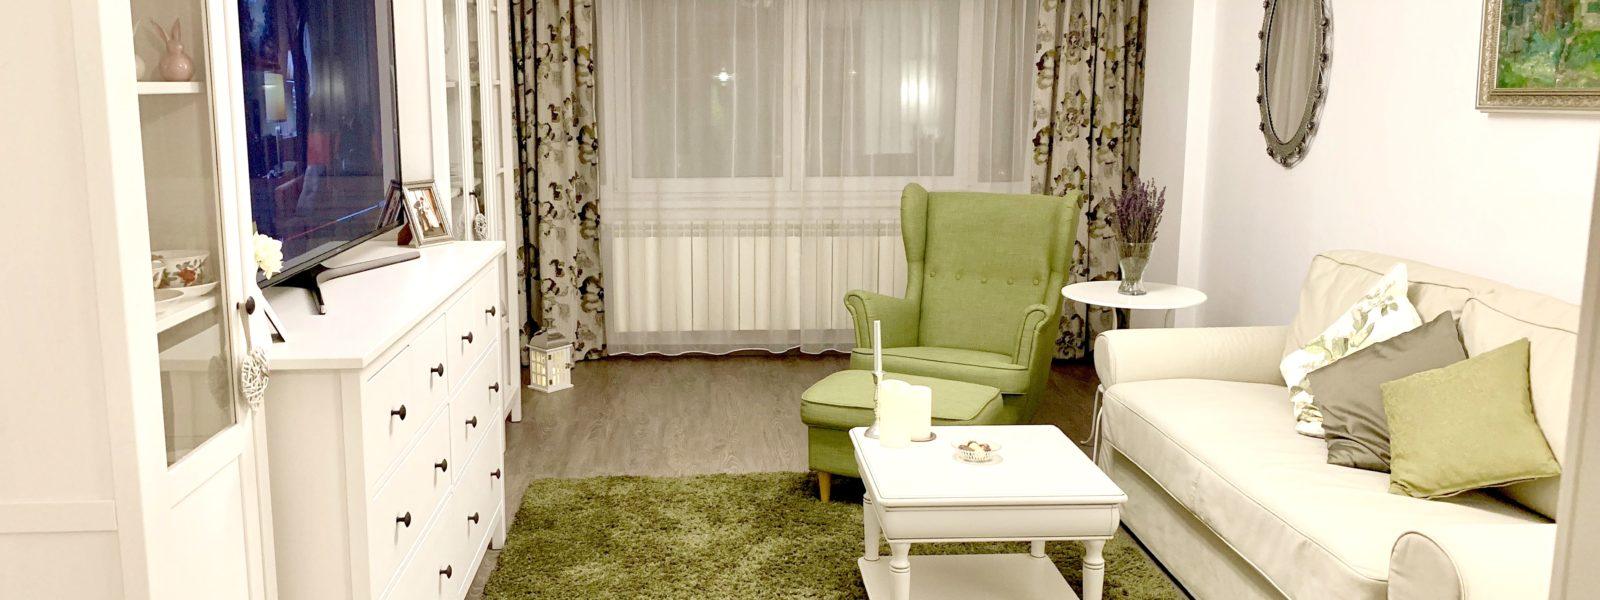 Apartament 4 camere decomandat, etaj 1, 90mp, Cetate!